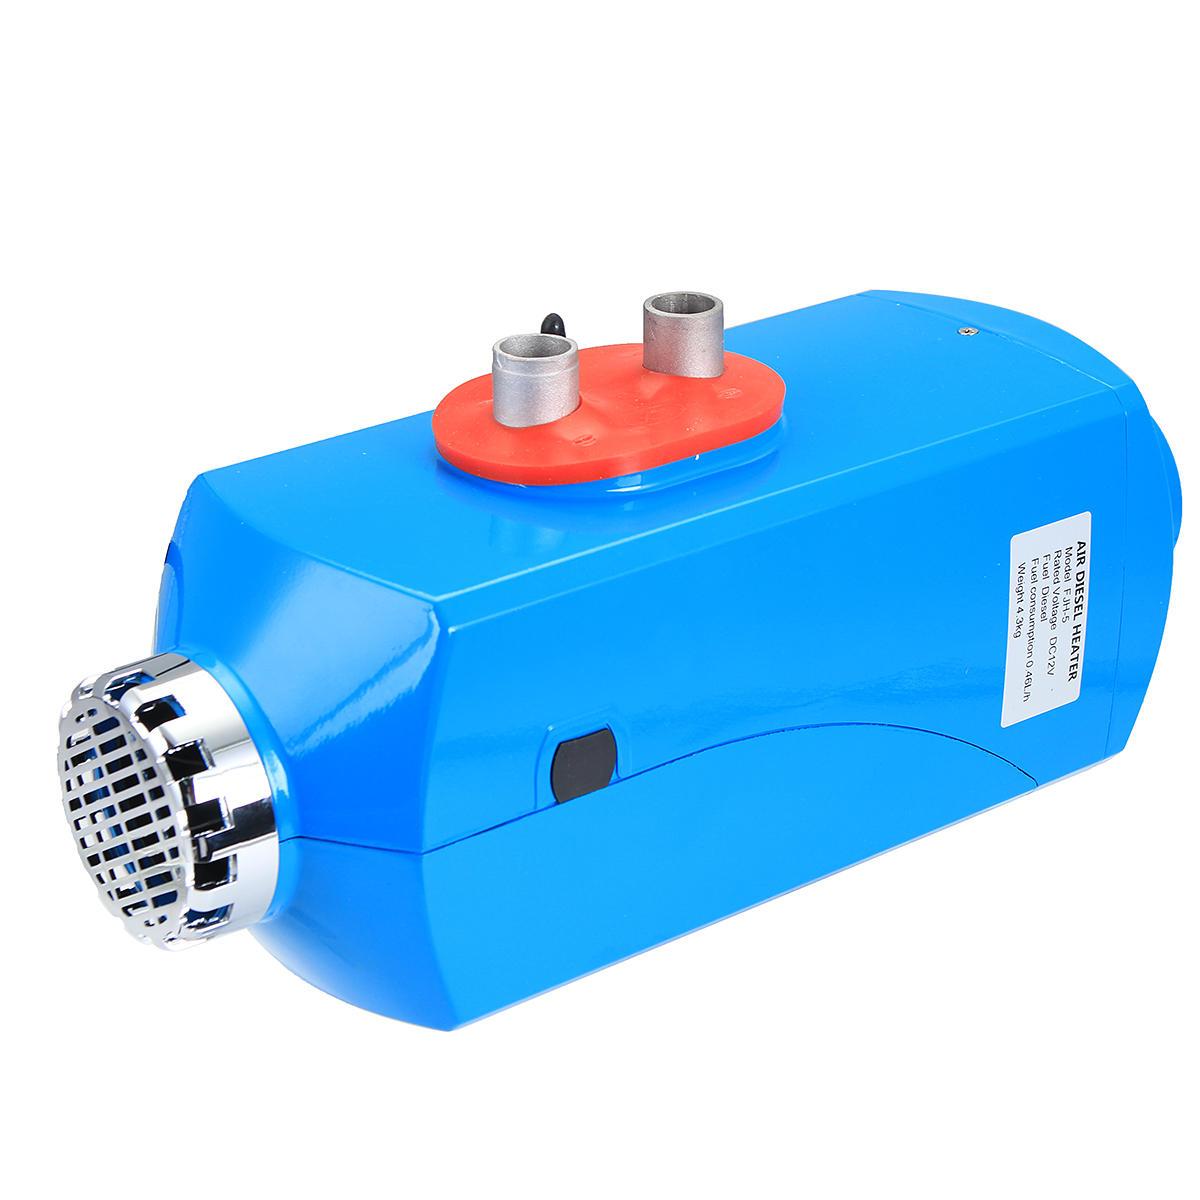 12V 5kw Diesel Air Parking Heater Diesel Heating Air Heater with Digital Switch